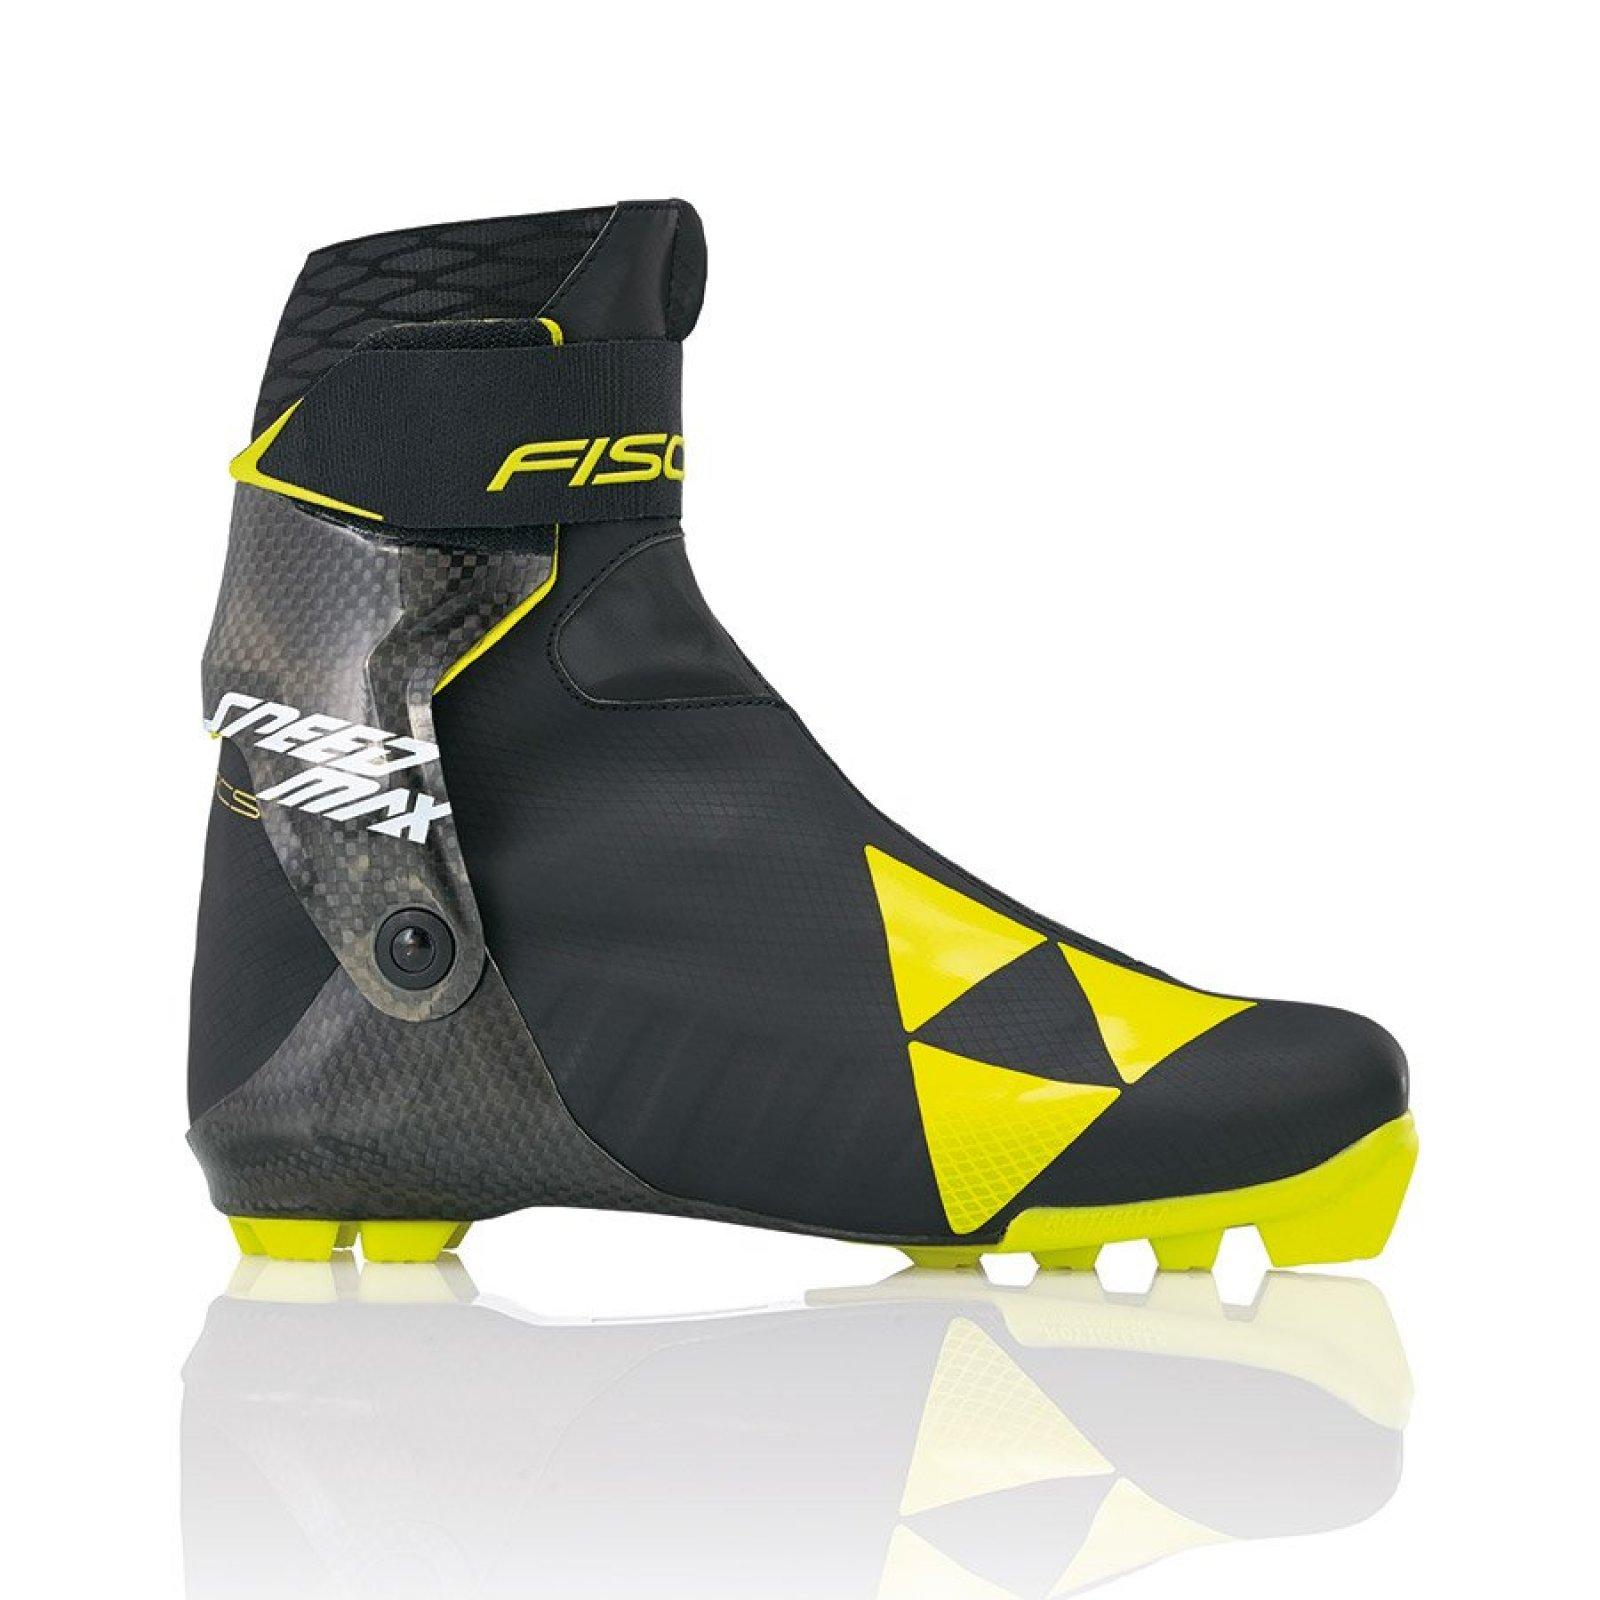 Boty na běžky Fischer Speedmax Skate 18 19 - Actisport.sk ac587f4c287